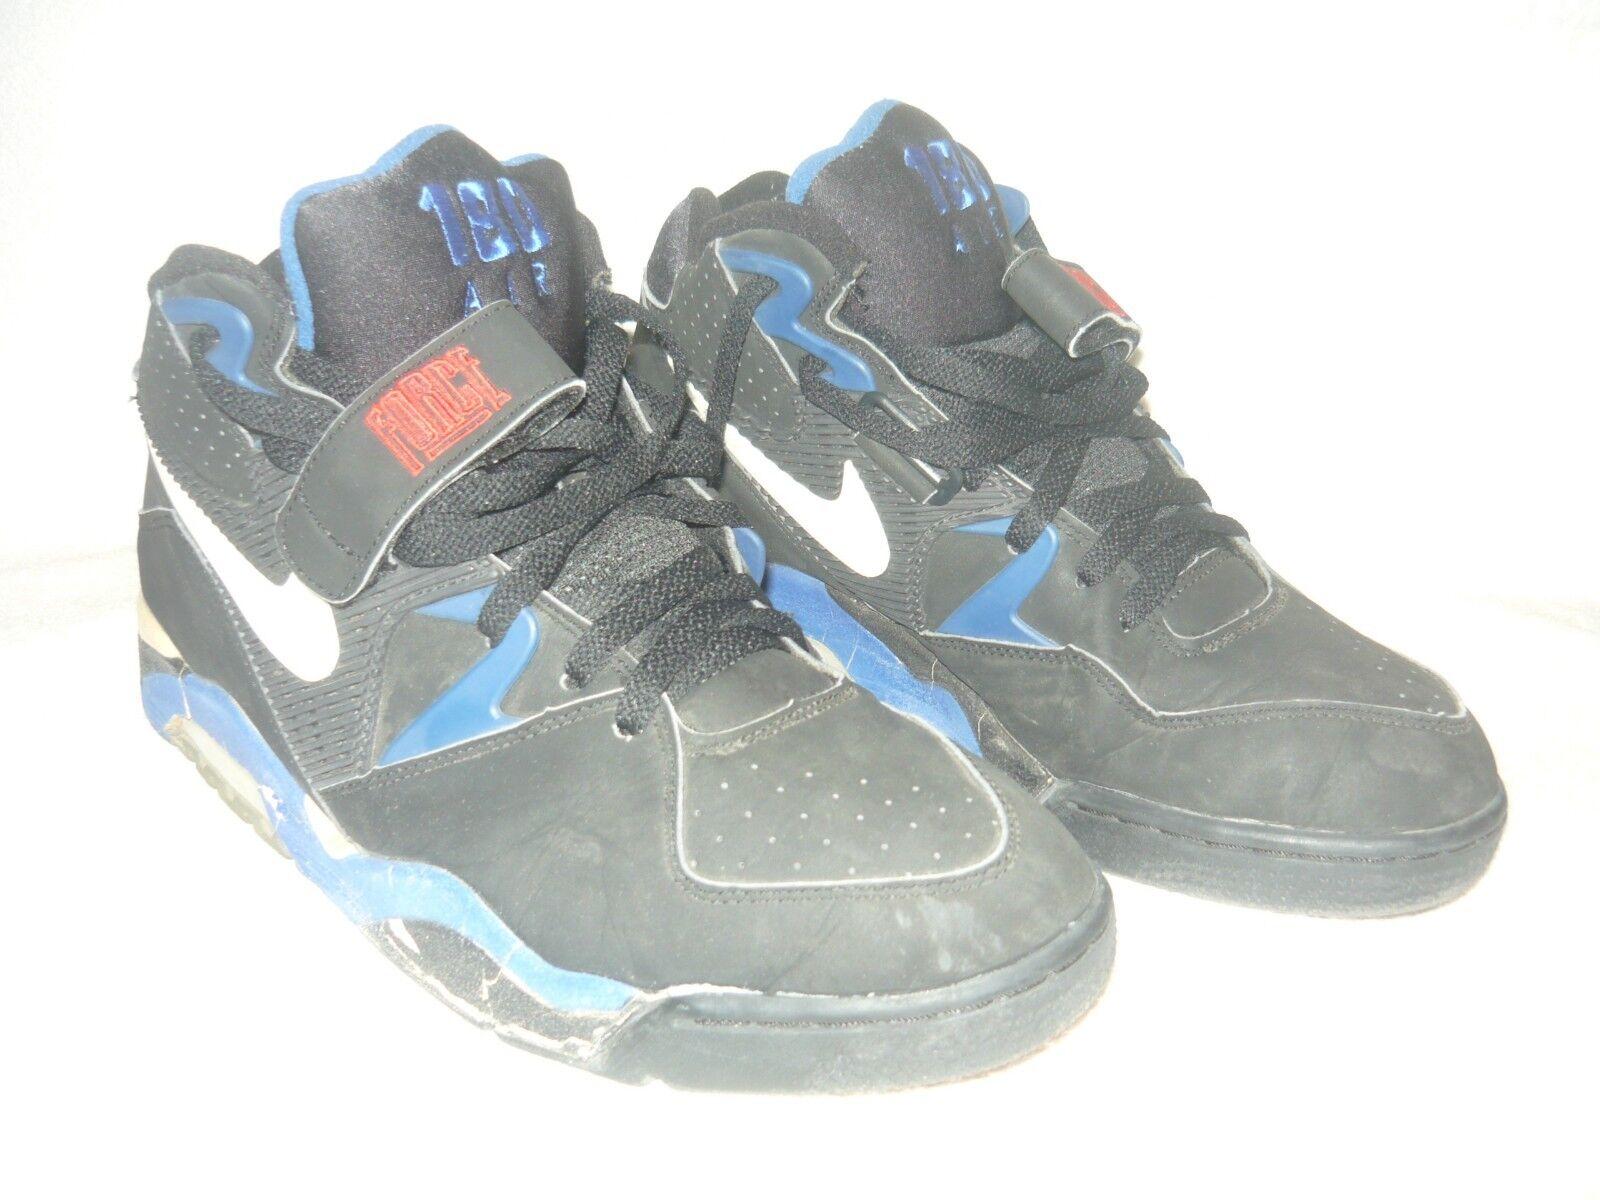 Nike 130010 Air Force 180 130010 Nike -010 Negro-Azul Real 2018 og Original Vintage b7780f